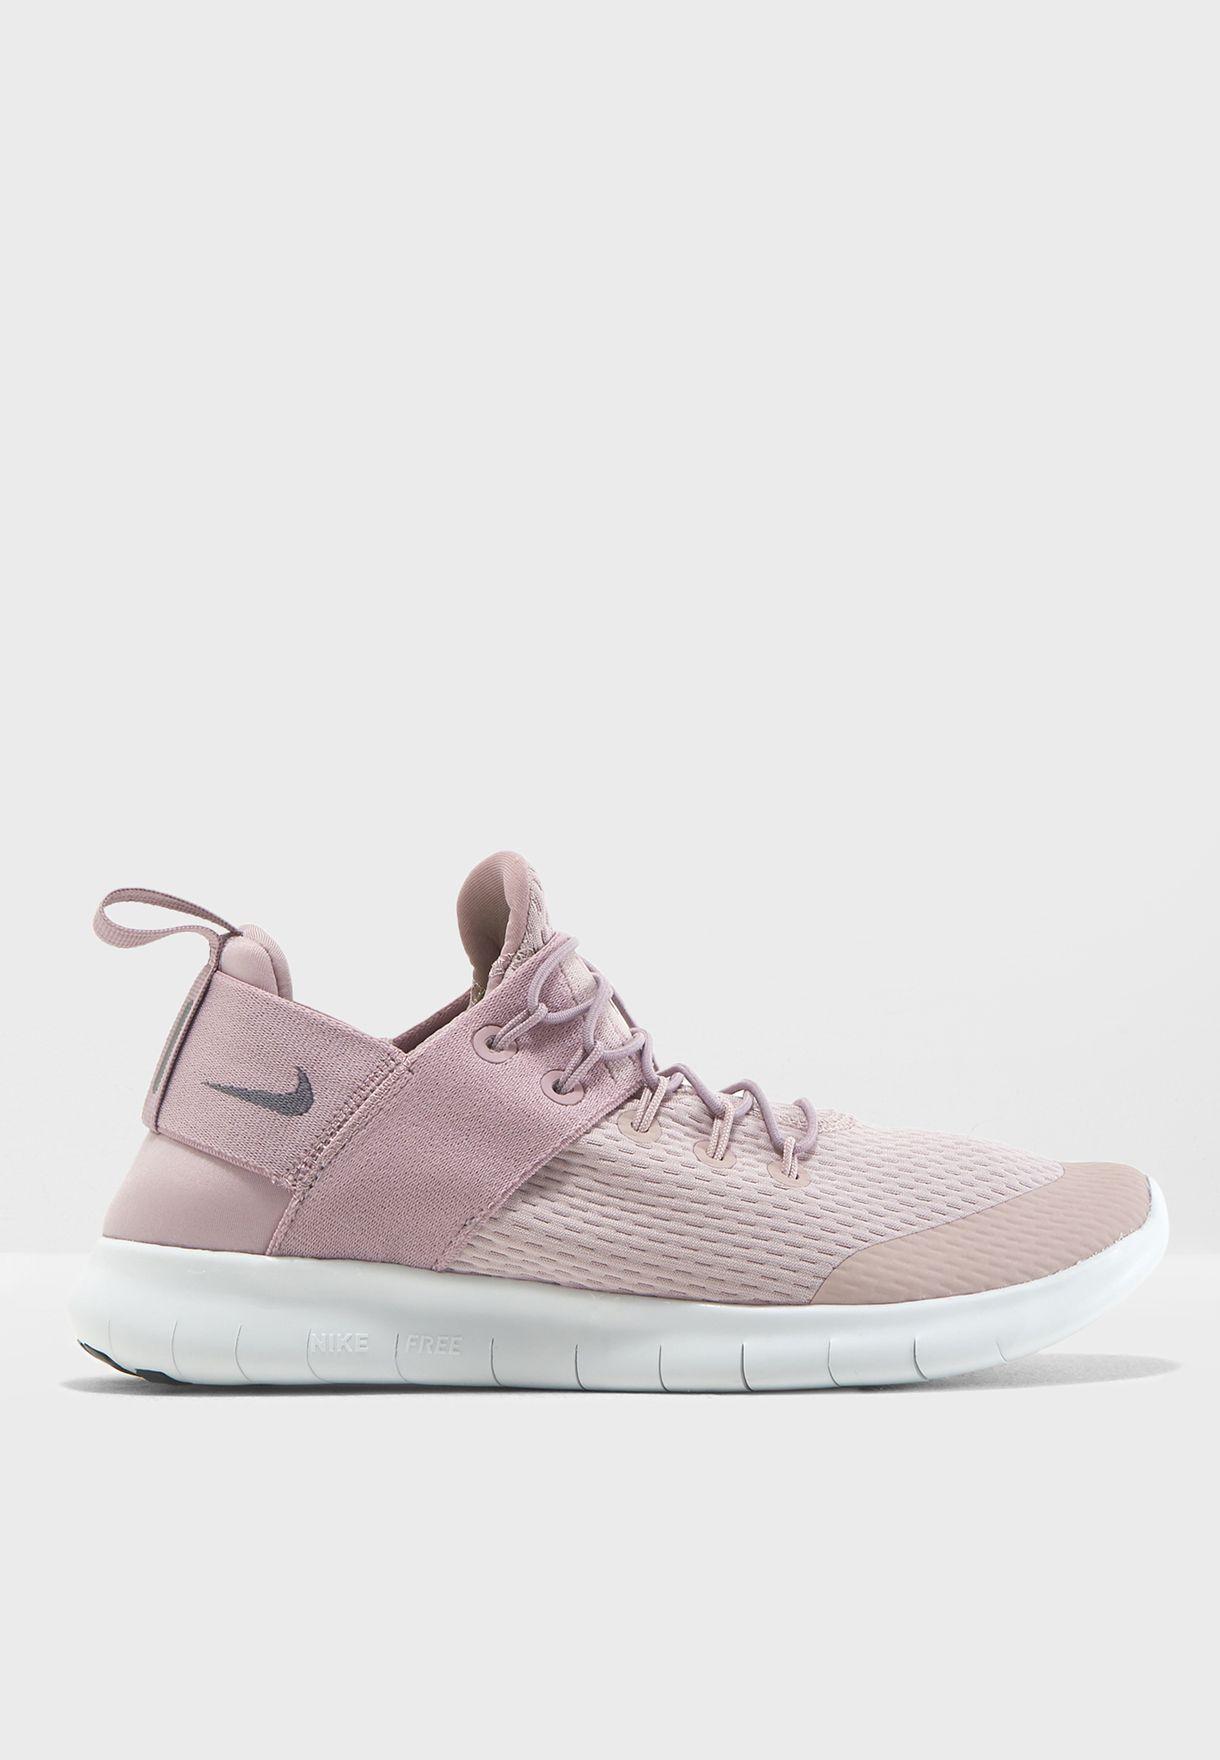 1a0ab9dc823d5 Shop Nike purple Free RN CMTR 2017 880842-602 for Women in Saudi ...